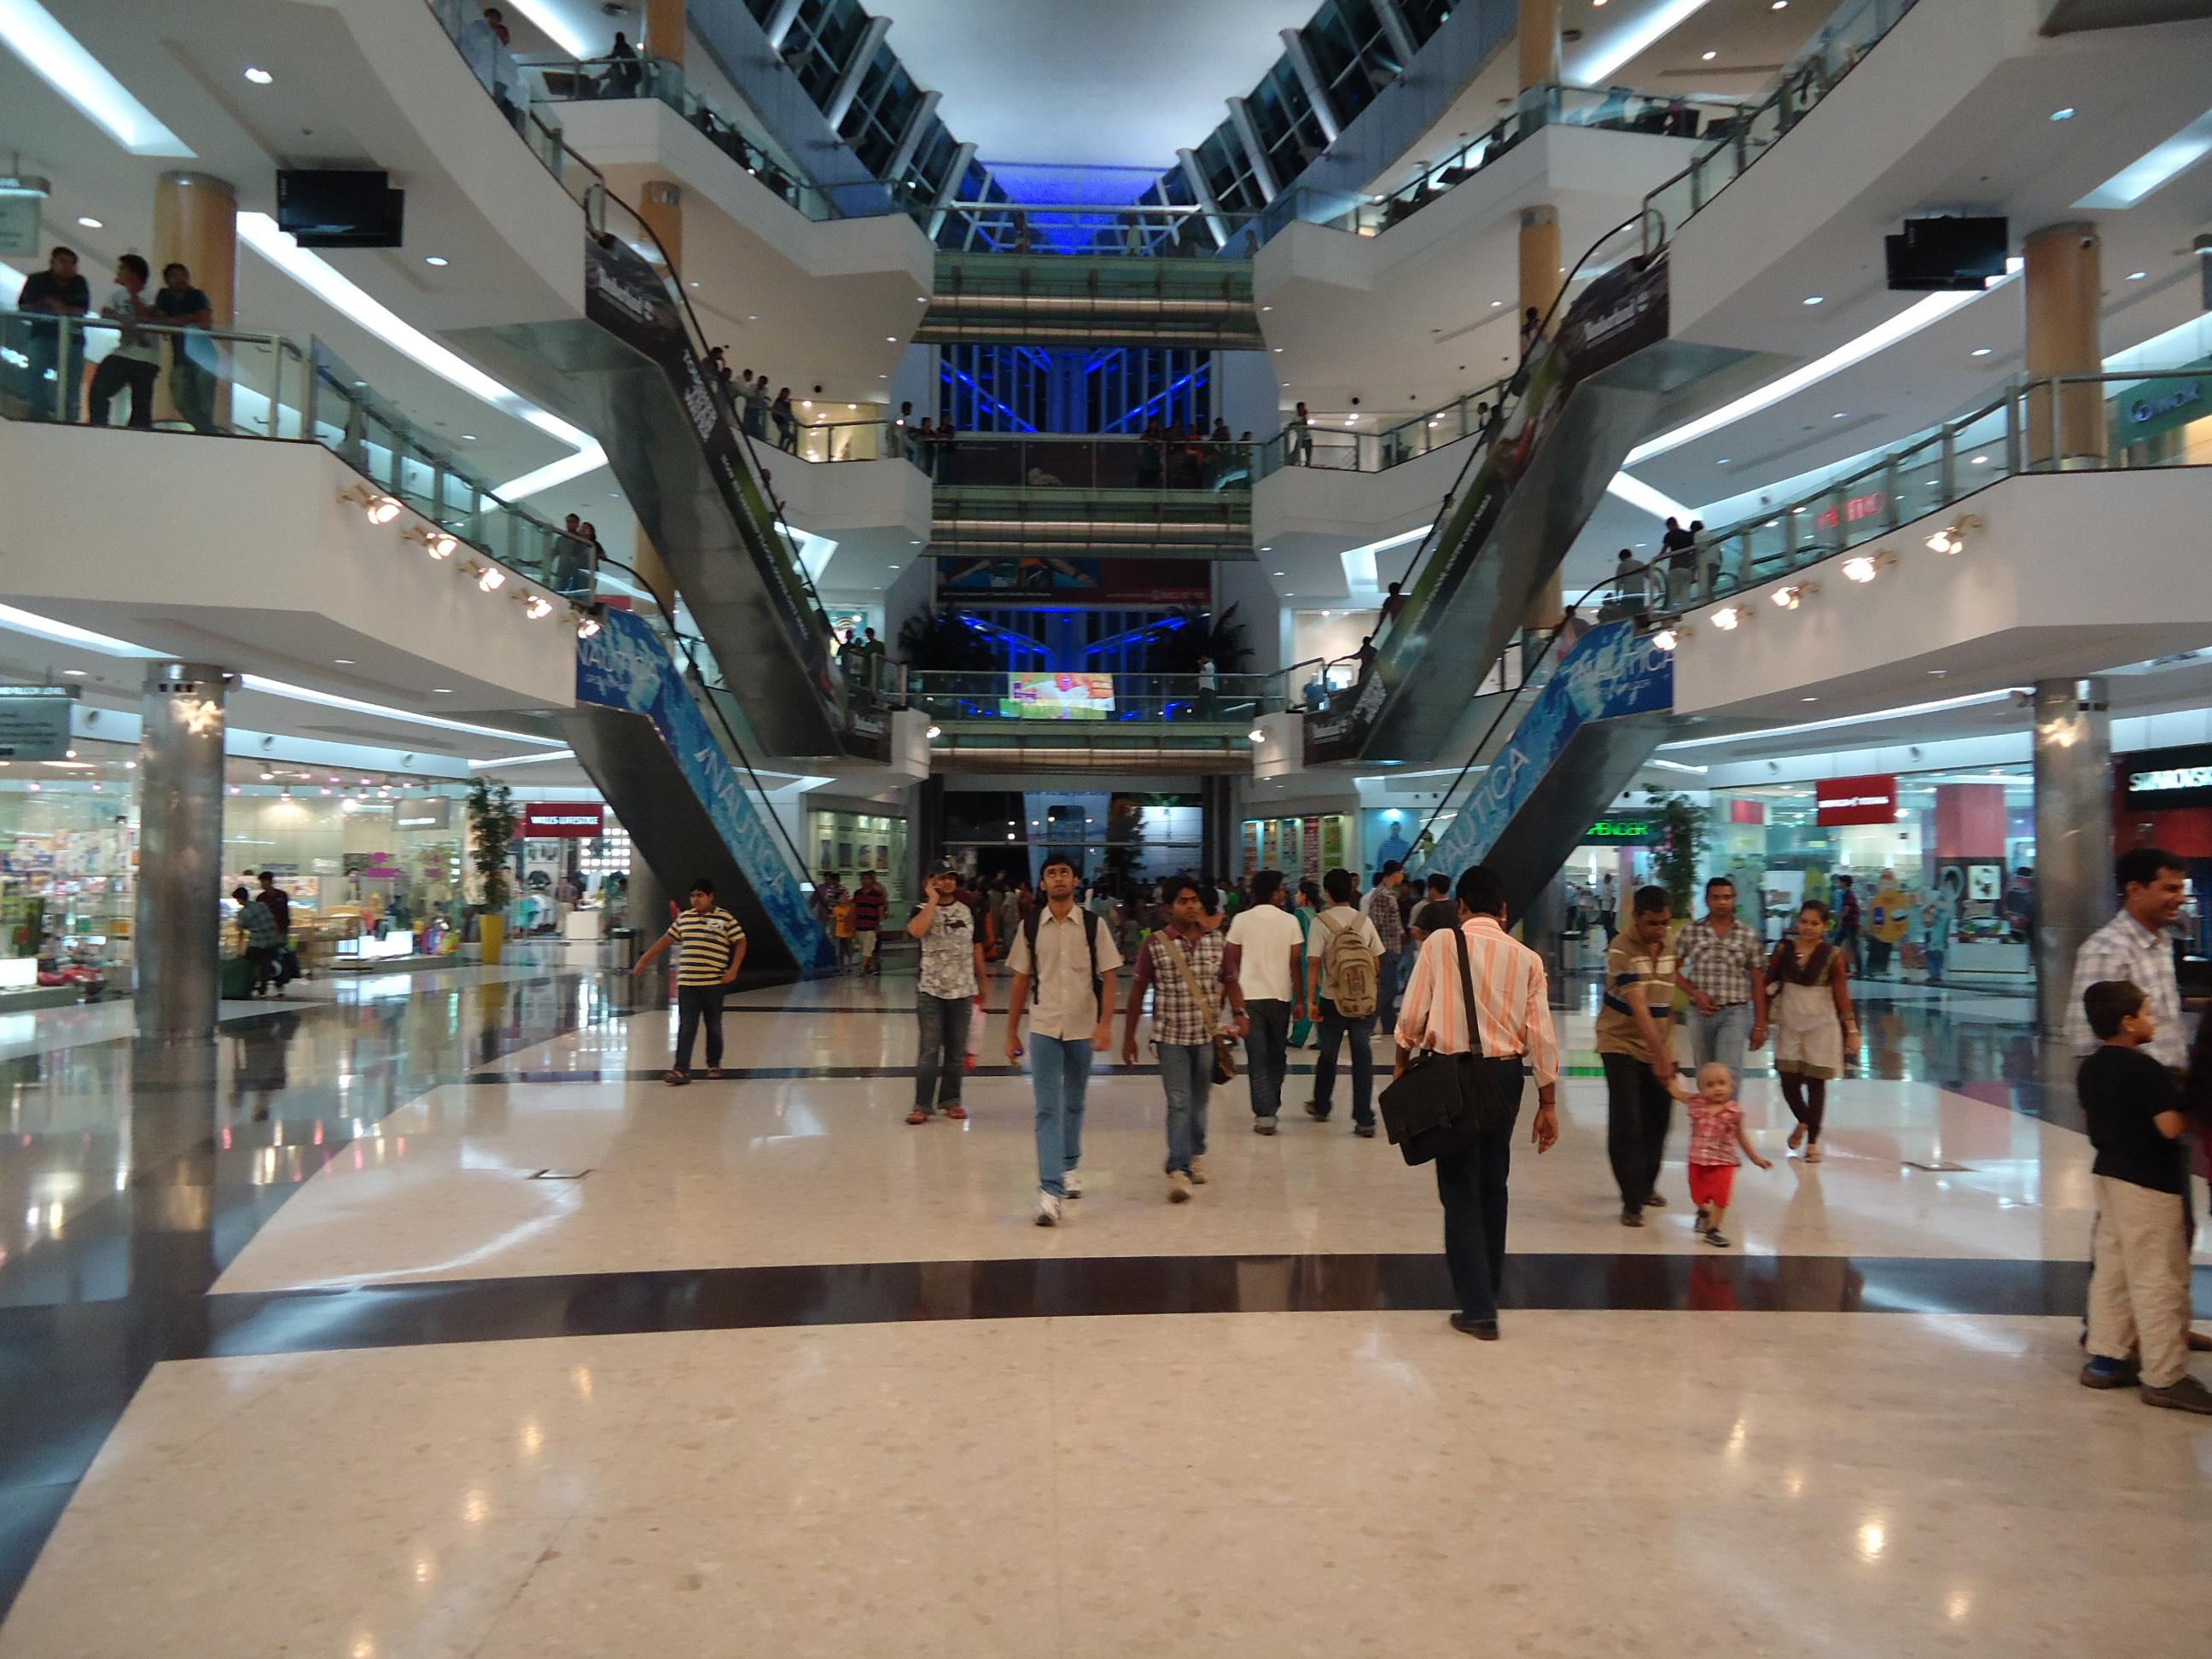 Kettering Retail Park Restaurants